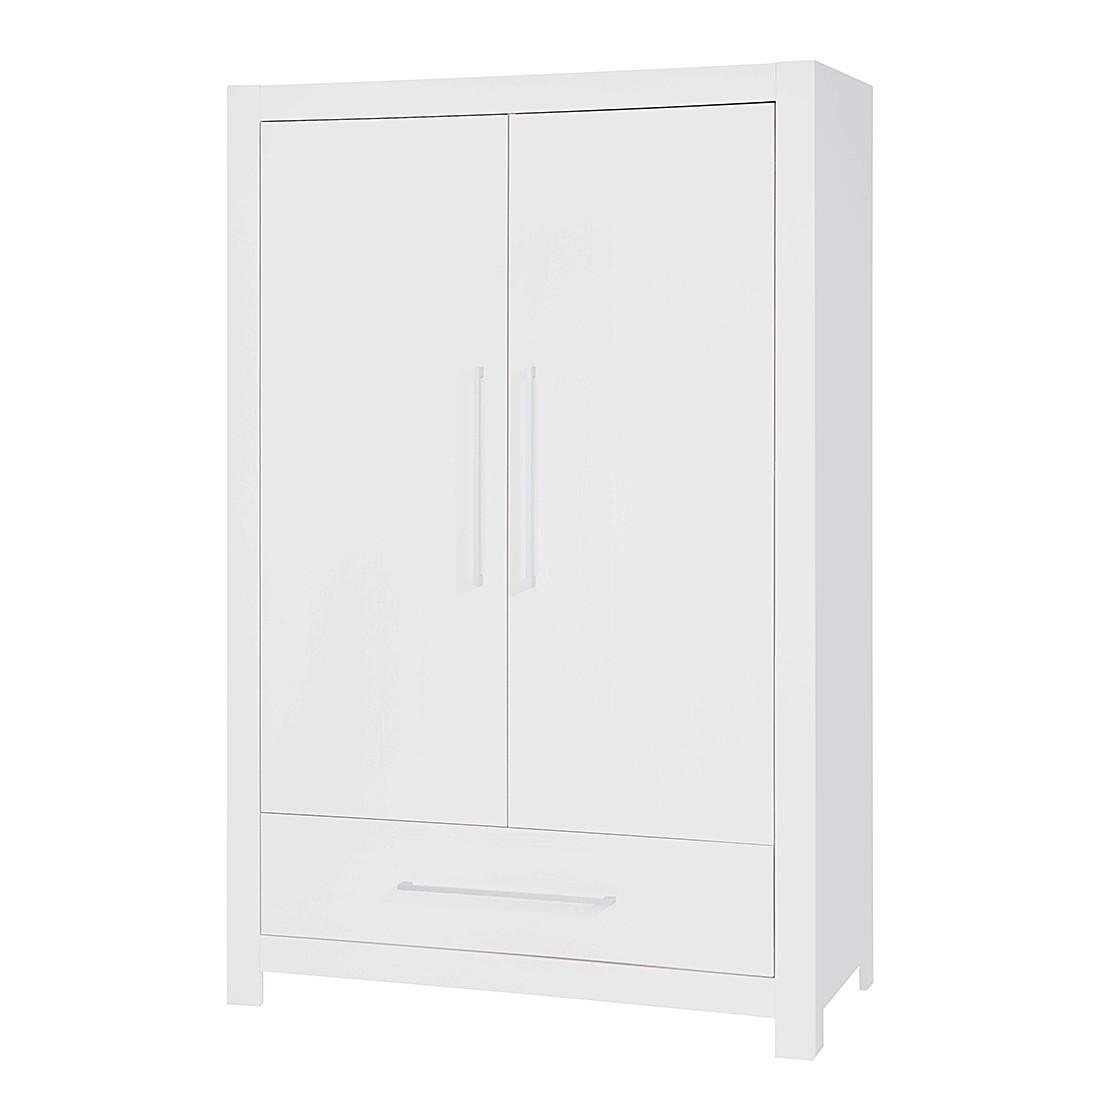 Armoire à vêtements Puro (2 portes) - Sapin - Blanc, Pinolino